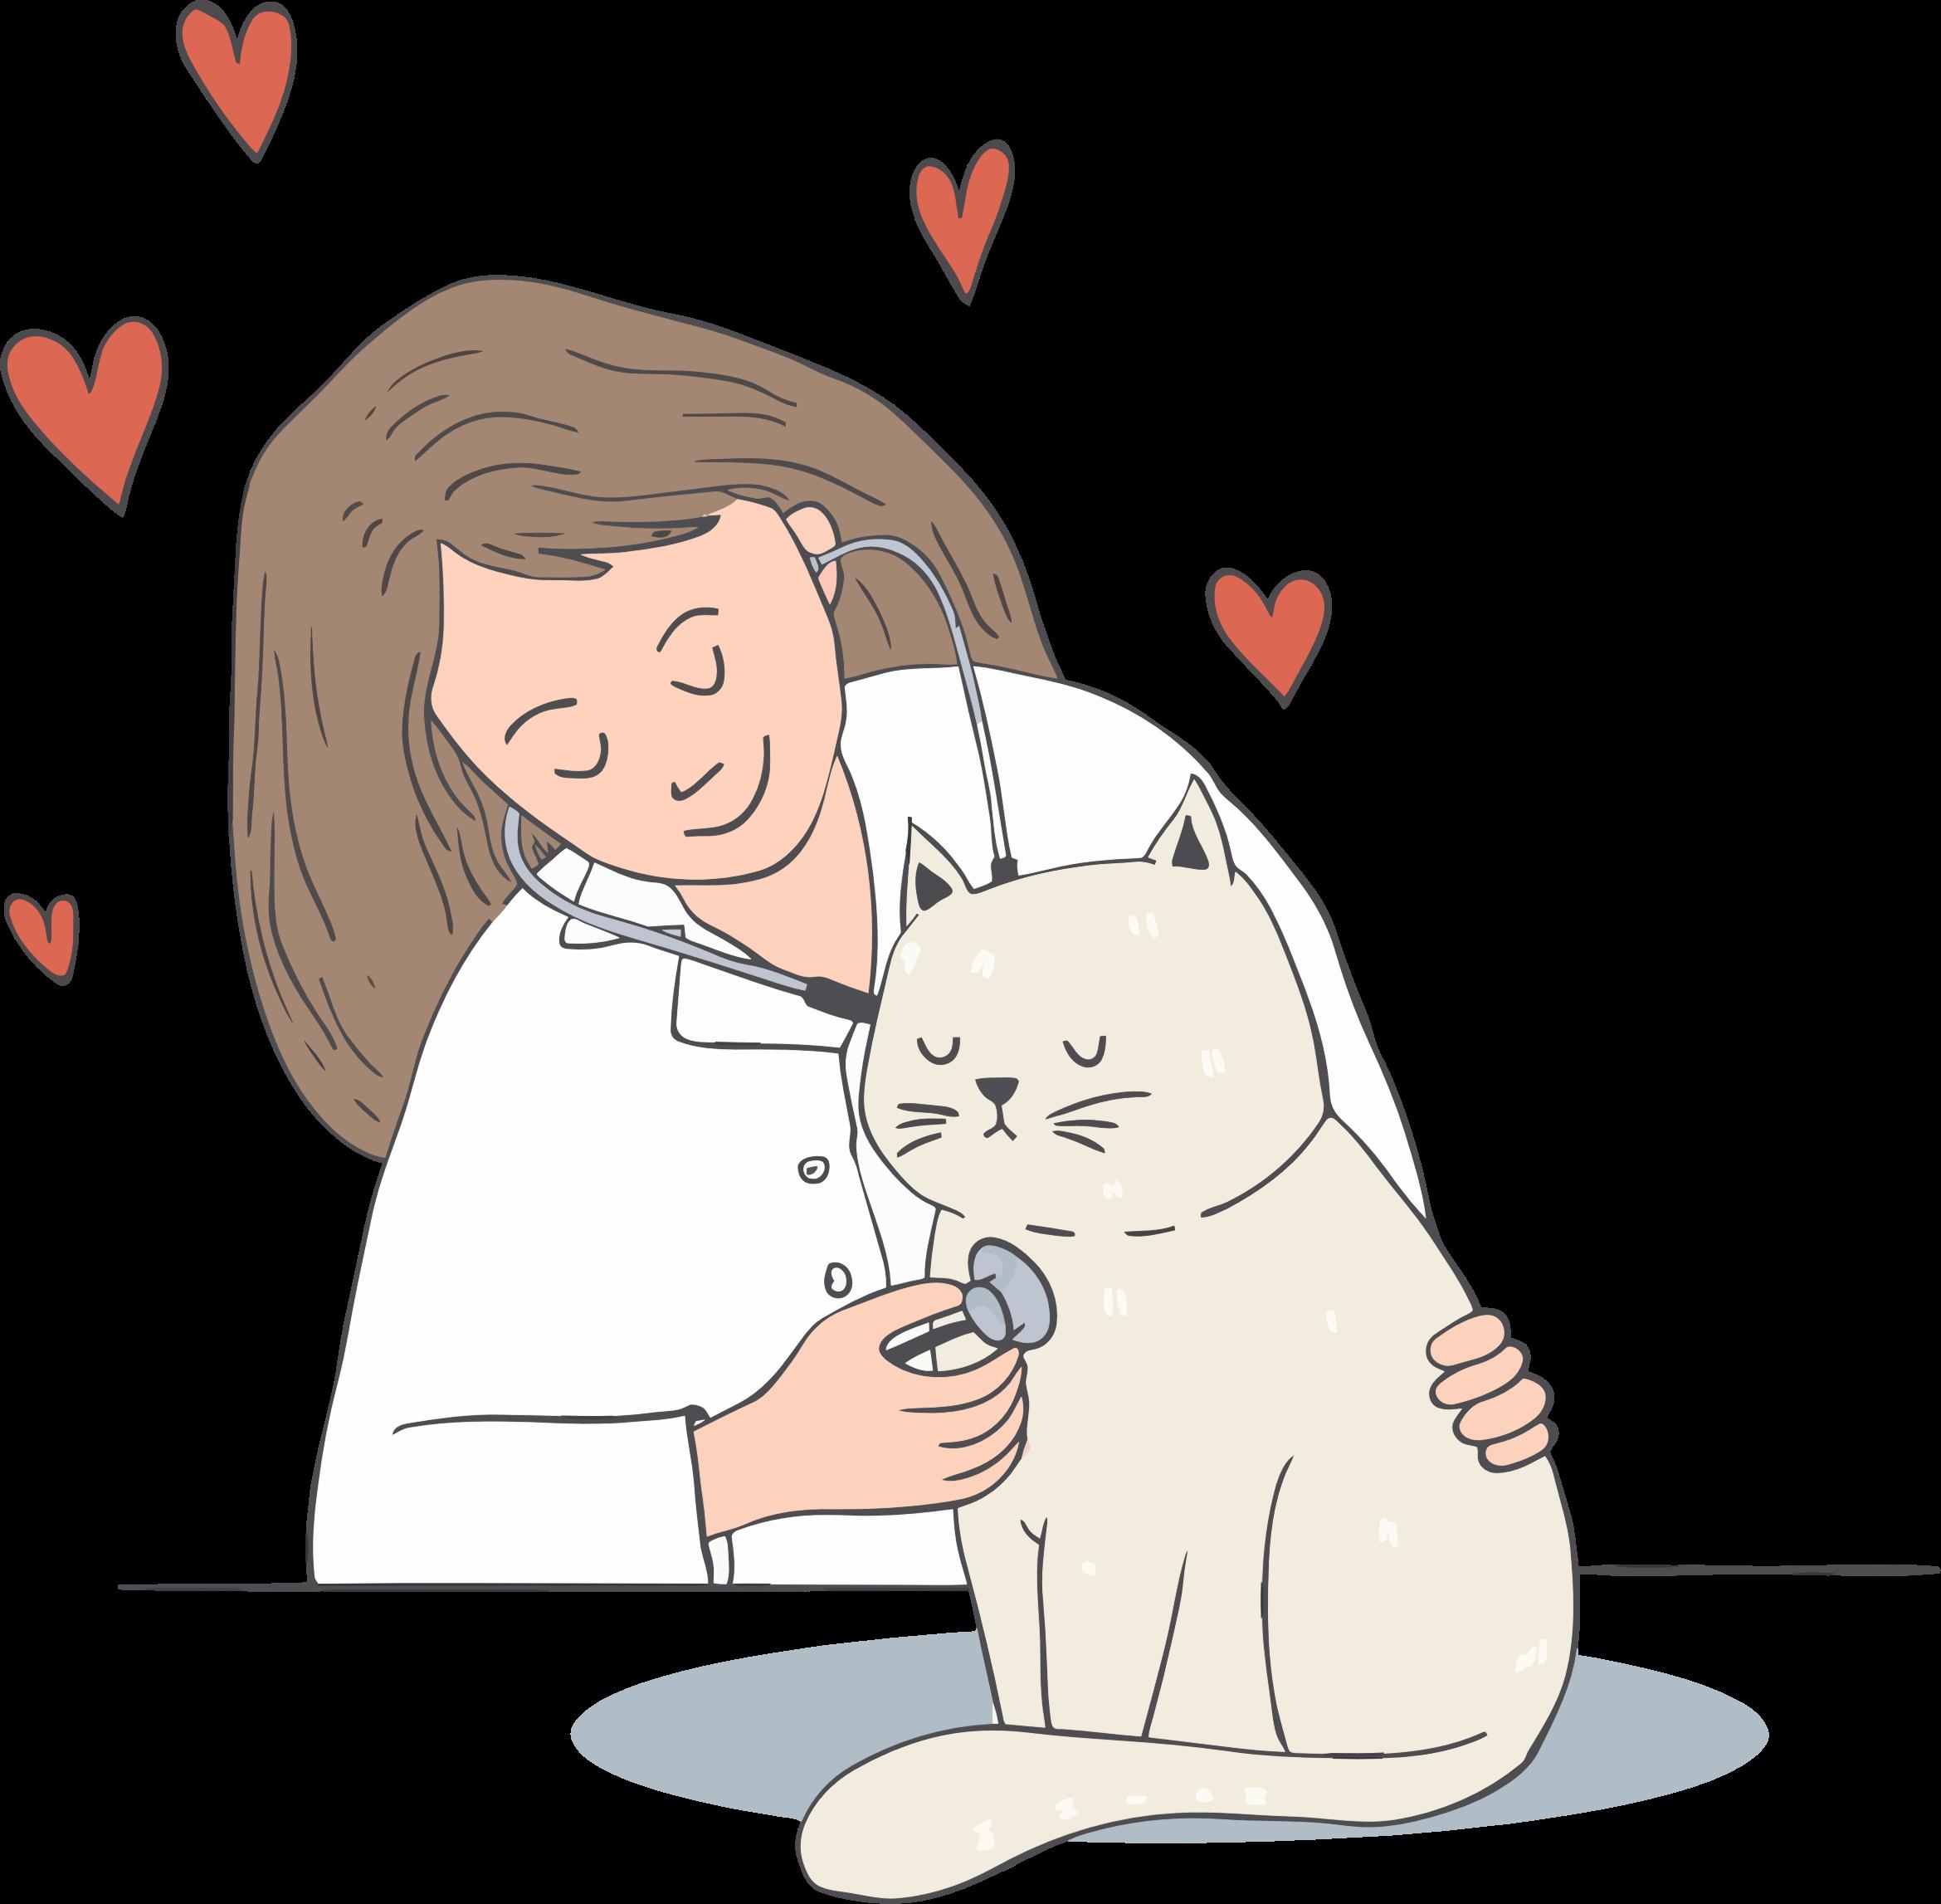 Cartoon veterinarian clipart clip art freeuse Cartoon veterinarian clipart images gallery for free download ... clip art freeuse